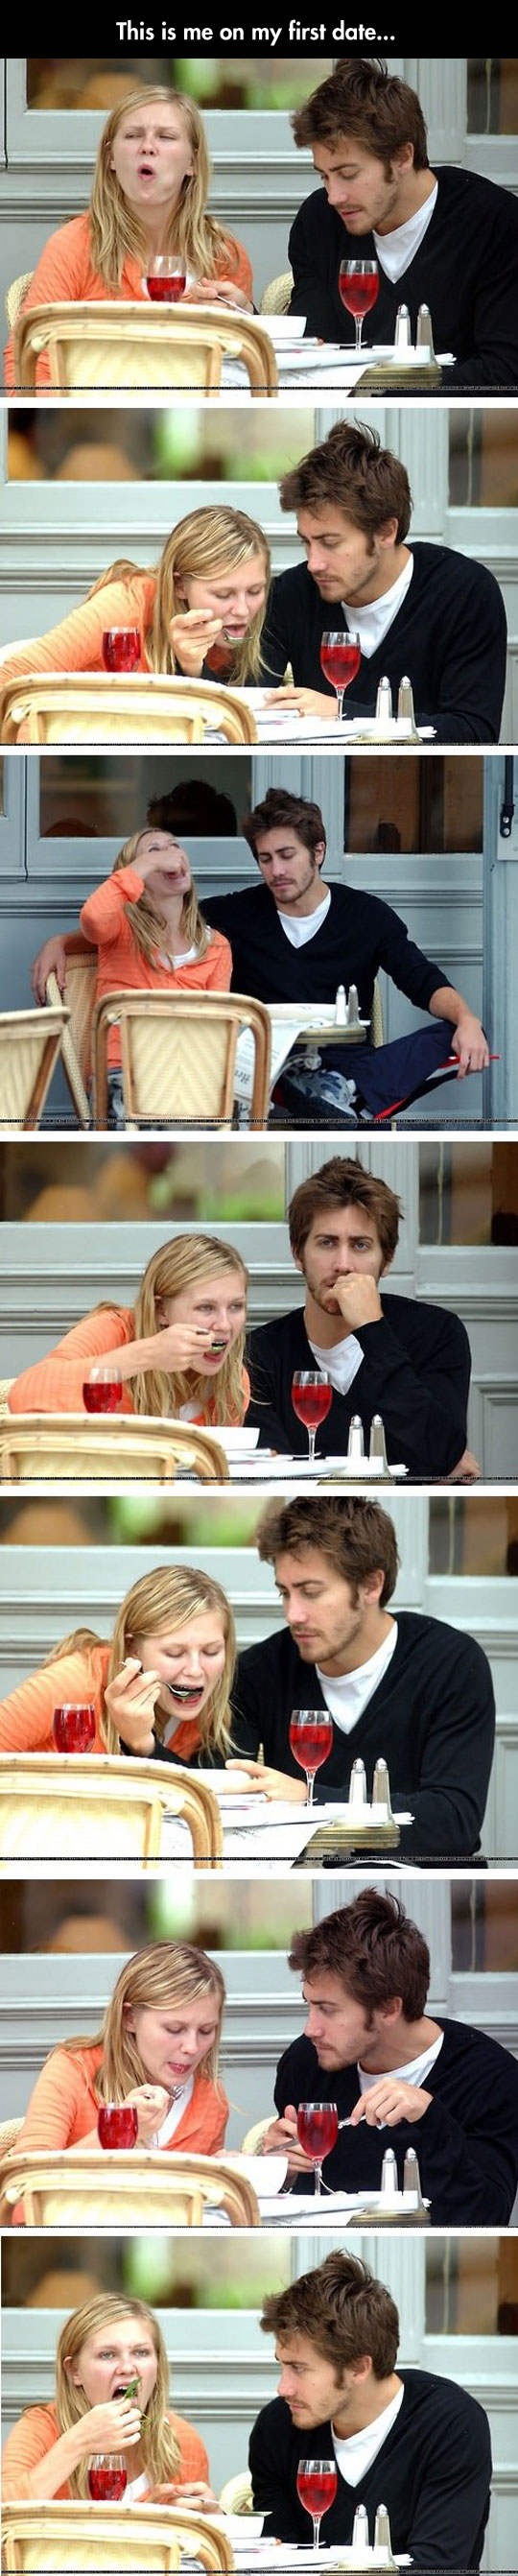 cool-Jake-Gilenhall-Kirsten-Dunst-eating